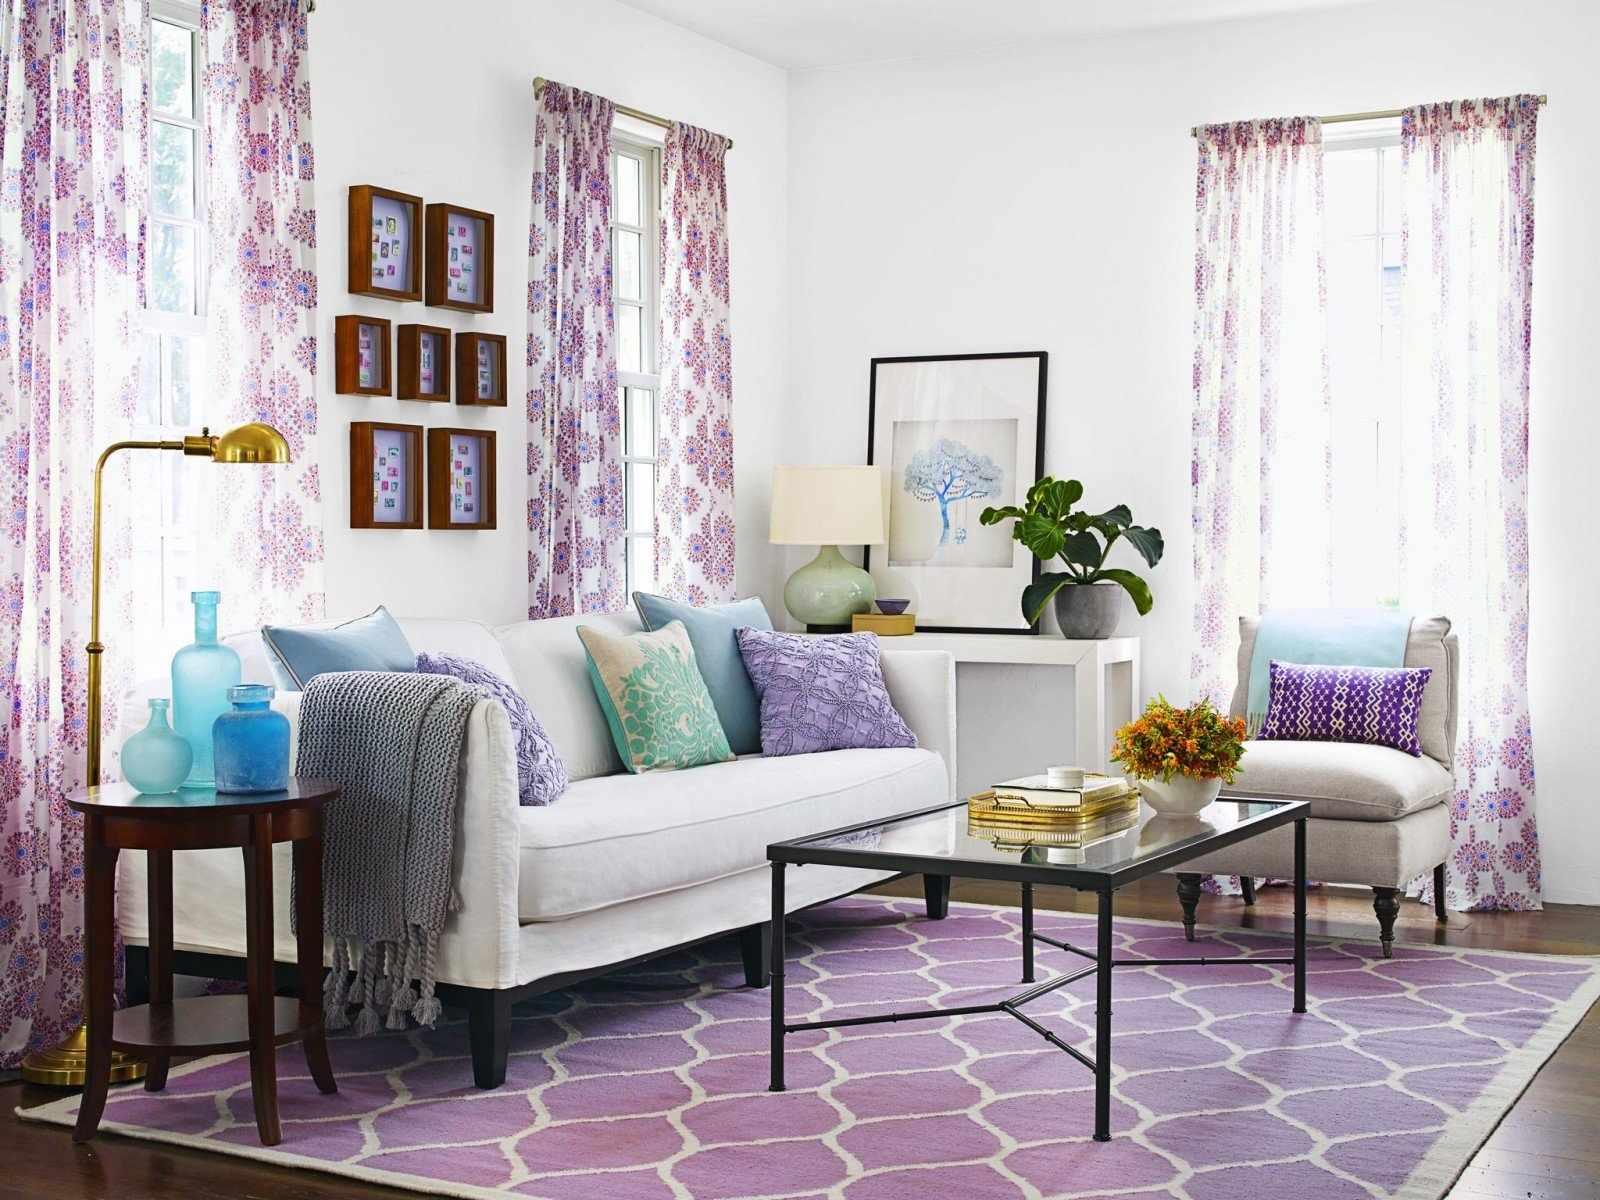 Изящный дизайн комнаты